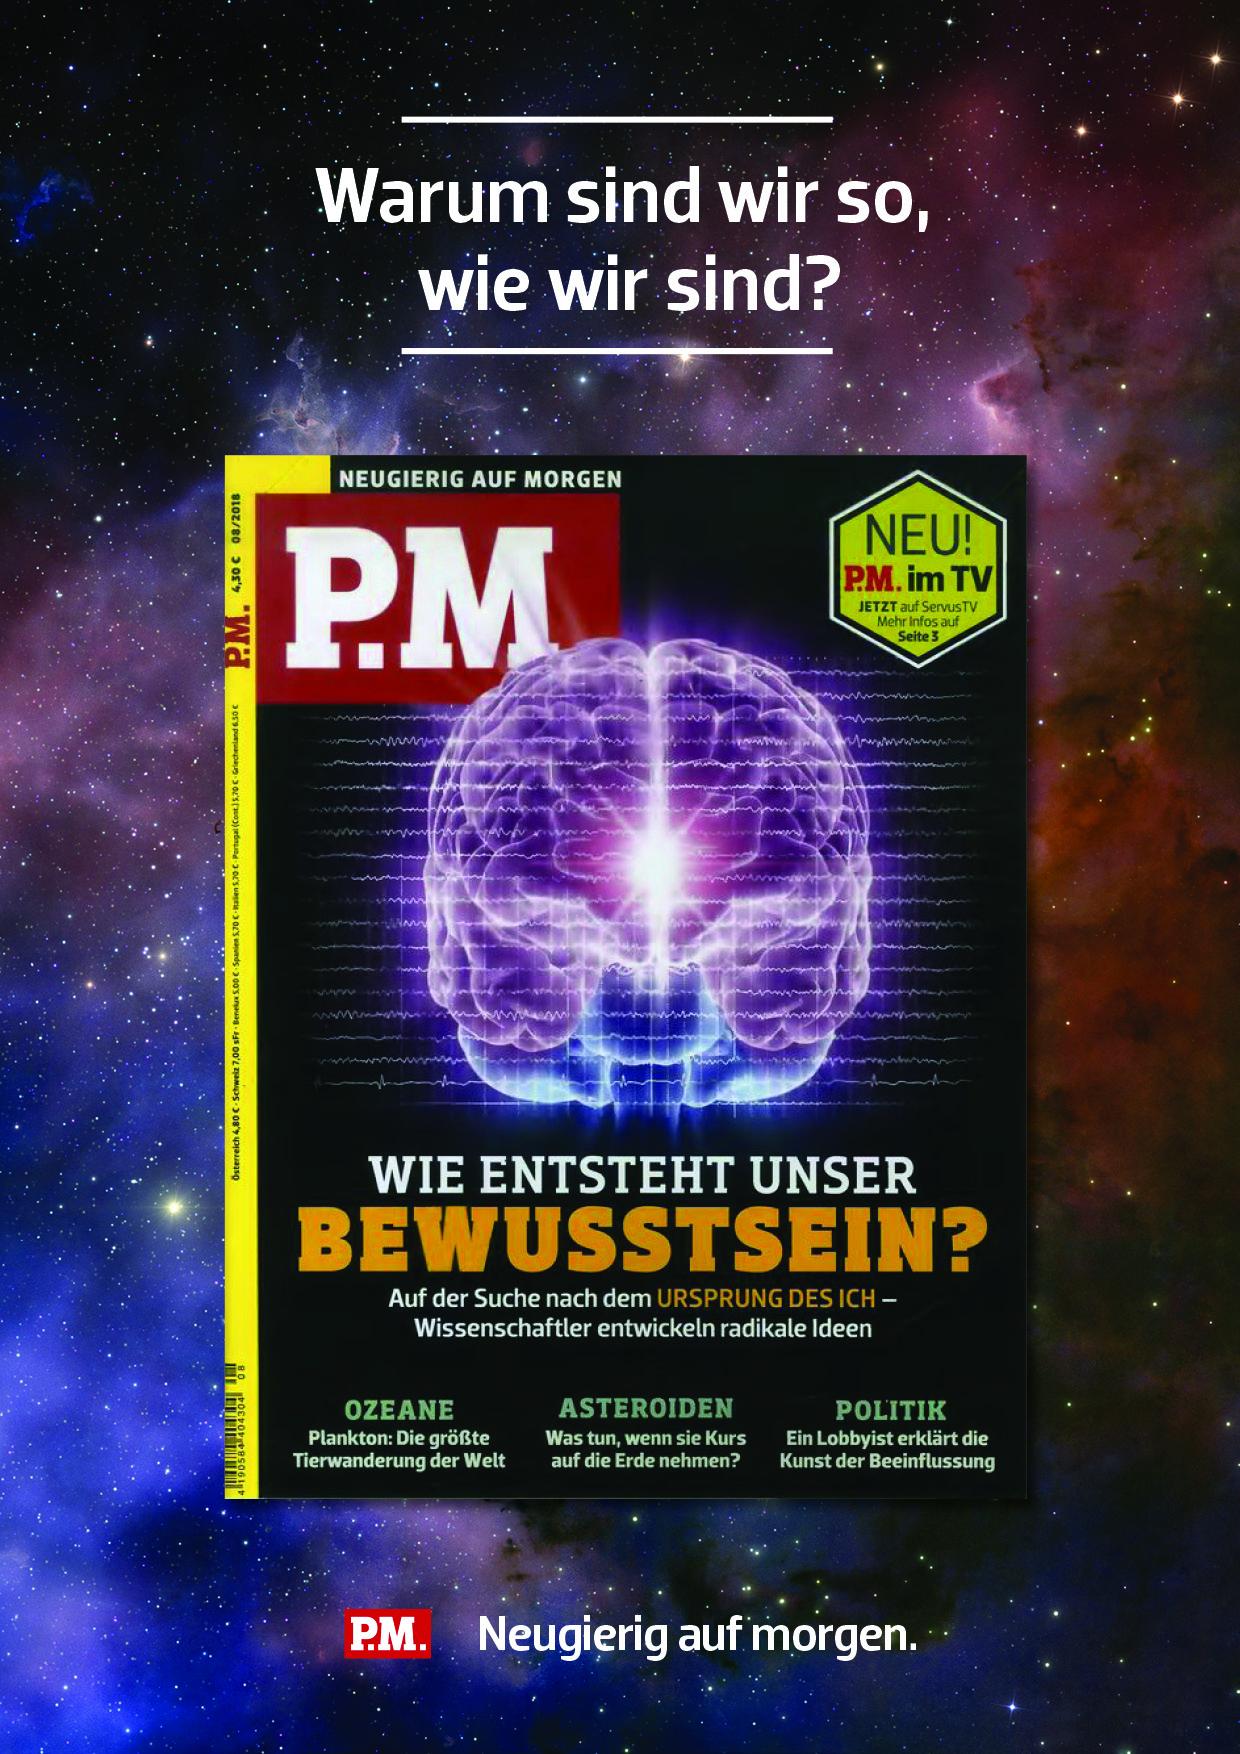 PM_bewusstsein_180606_ar.jpg